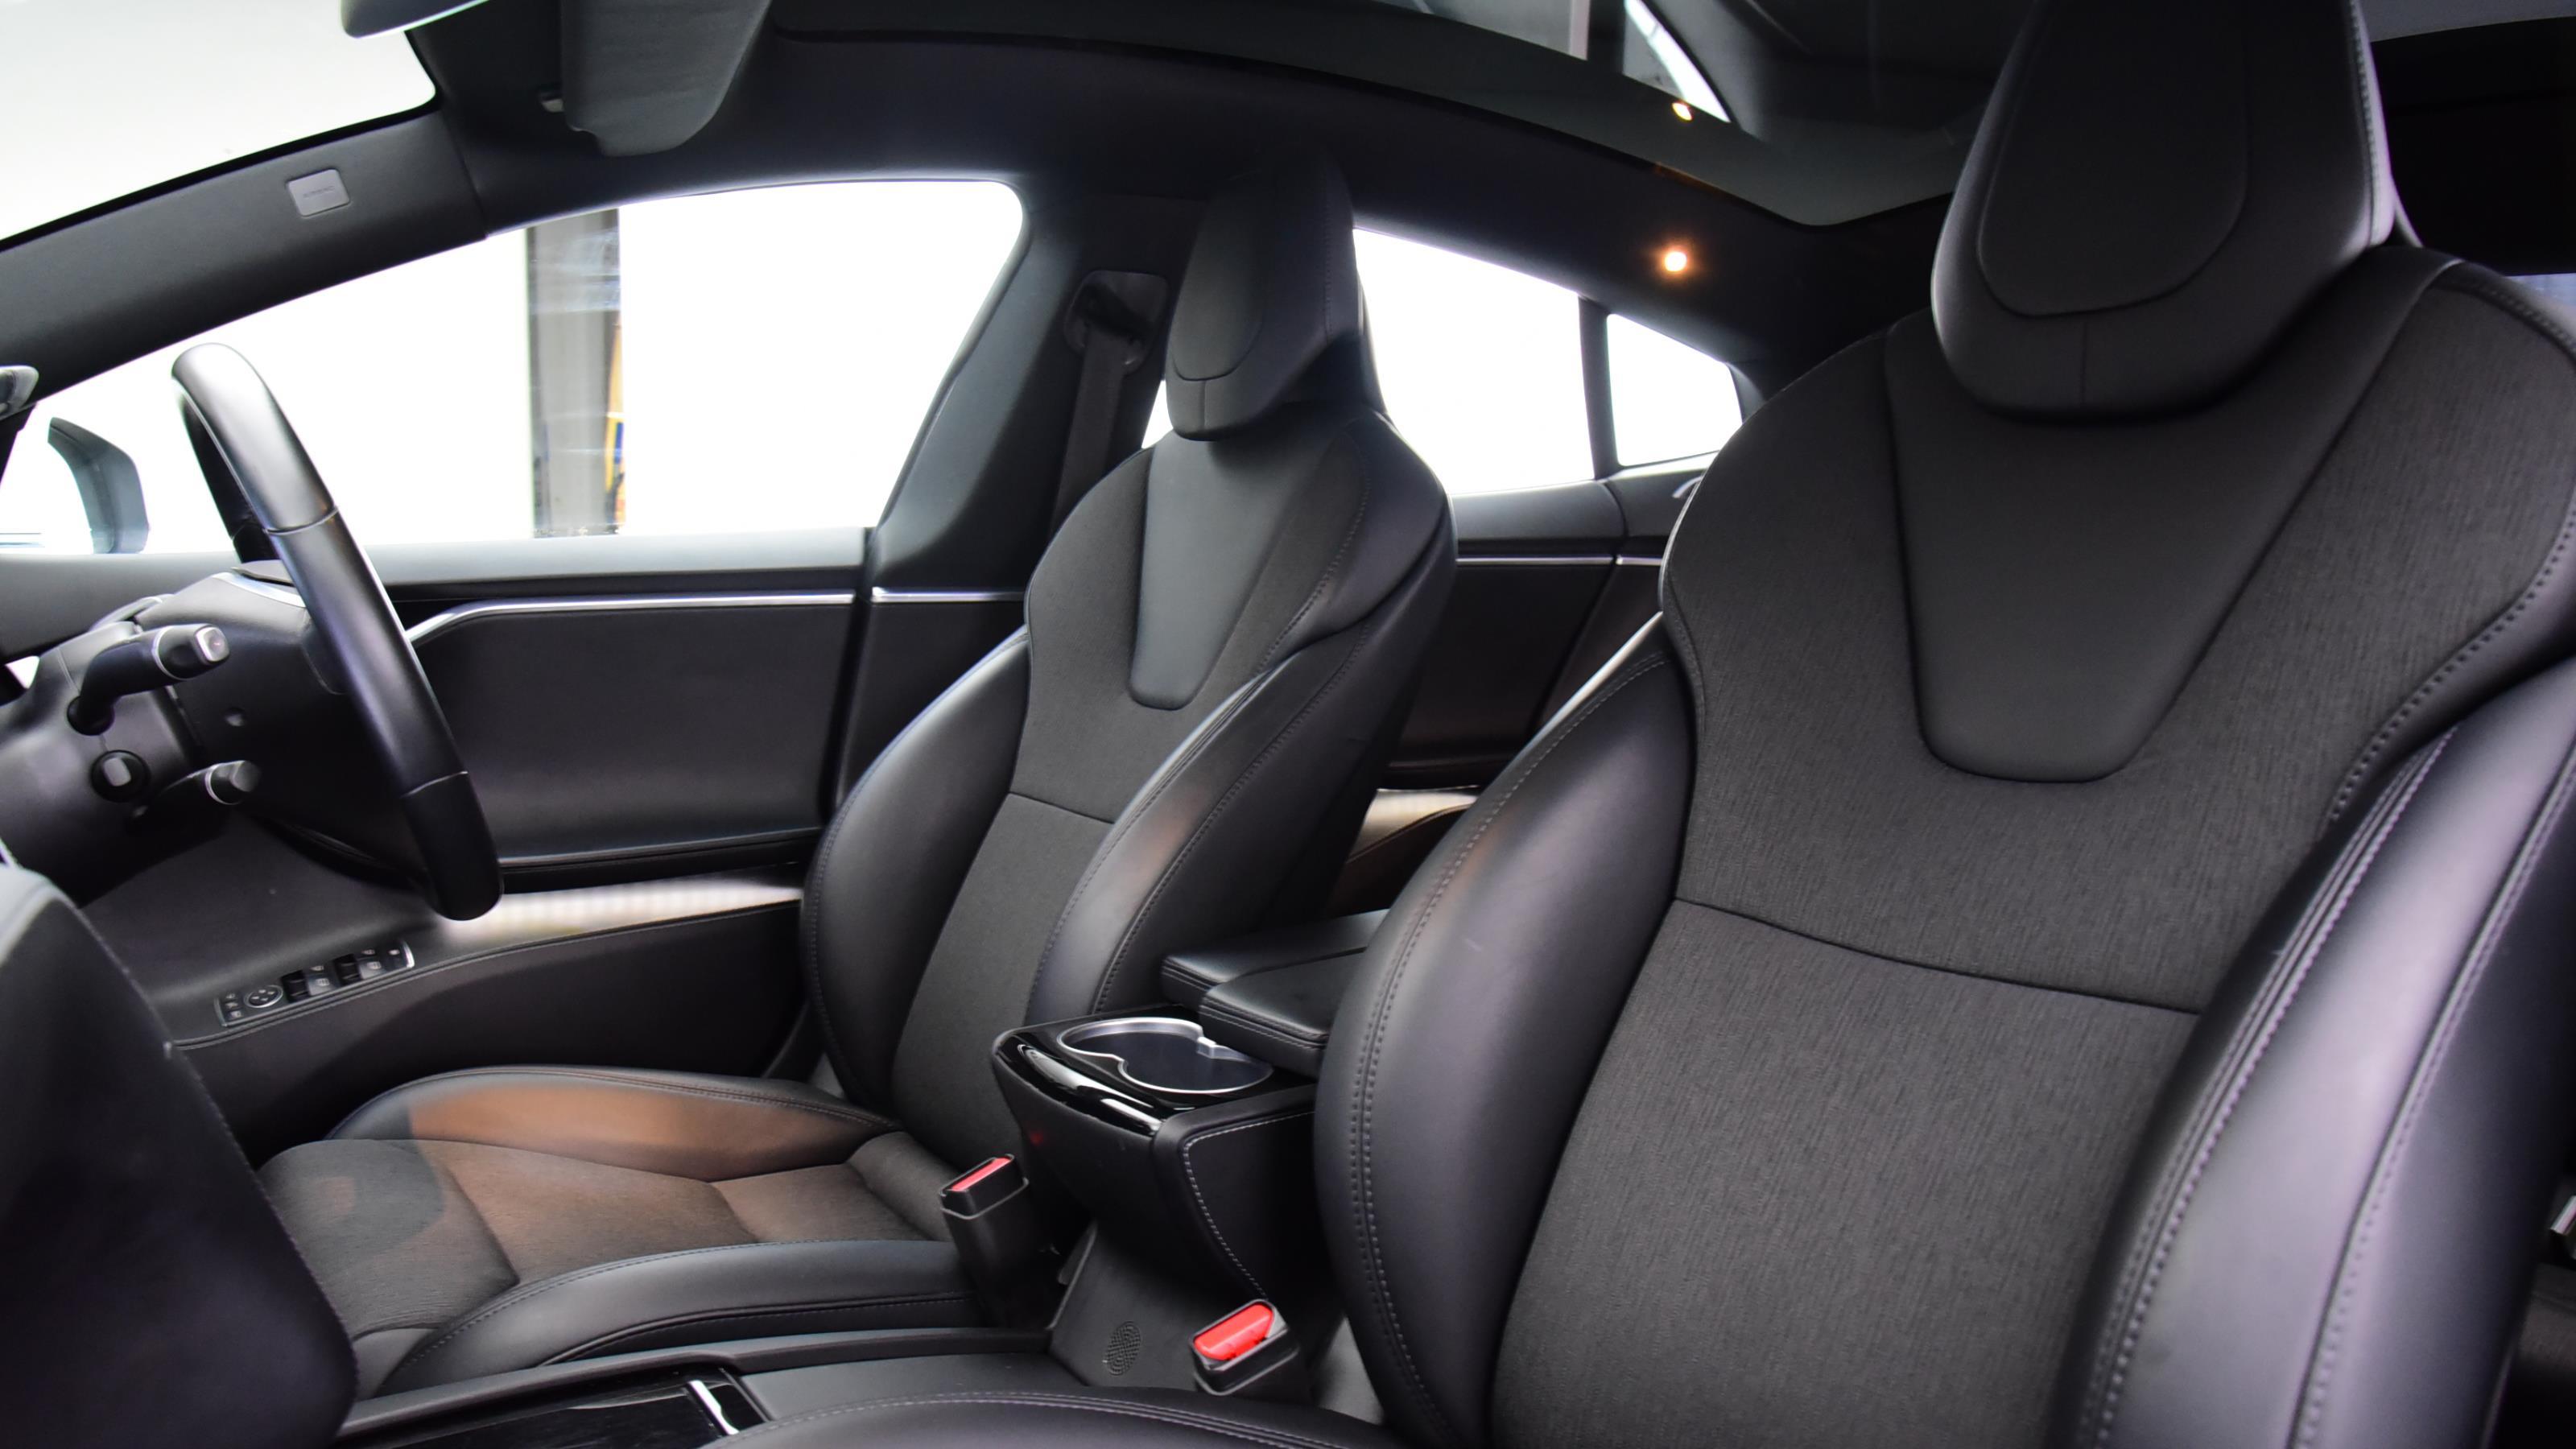 Used 2018 Tesla MODEL S 449kW 100kWh Dual Motor 5dr Auto WHITE at Saxton4x4